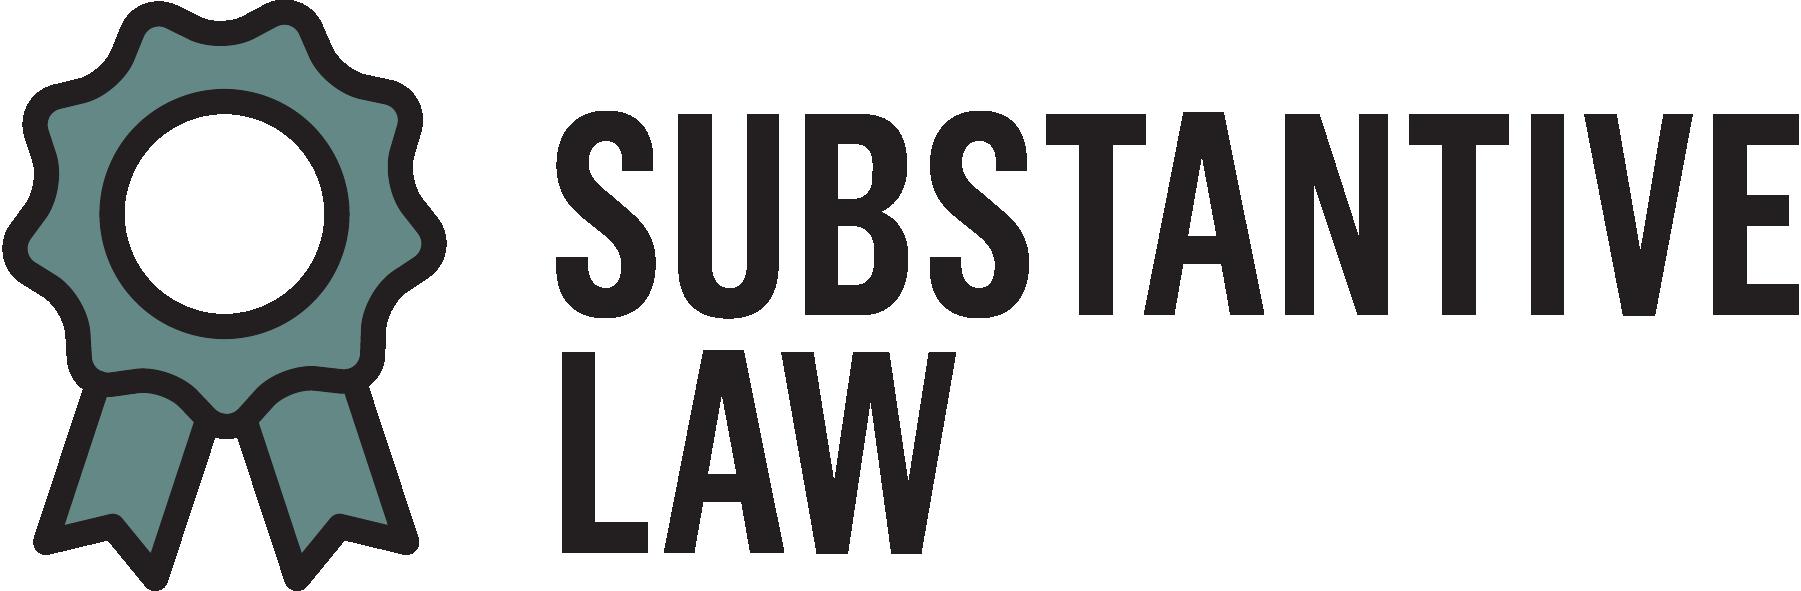 Sub Law